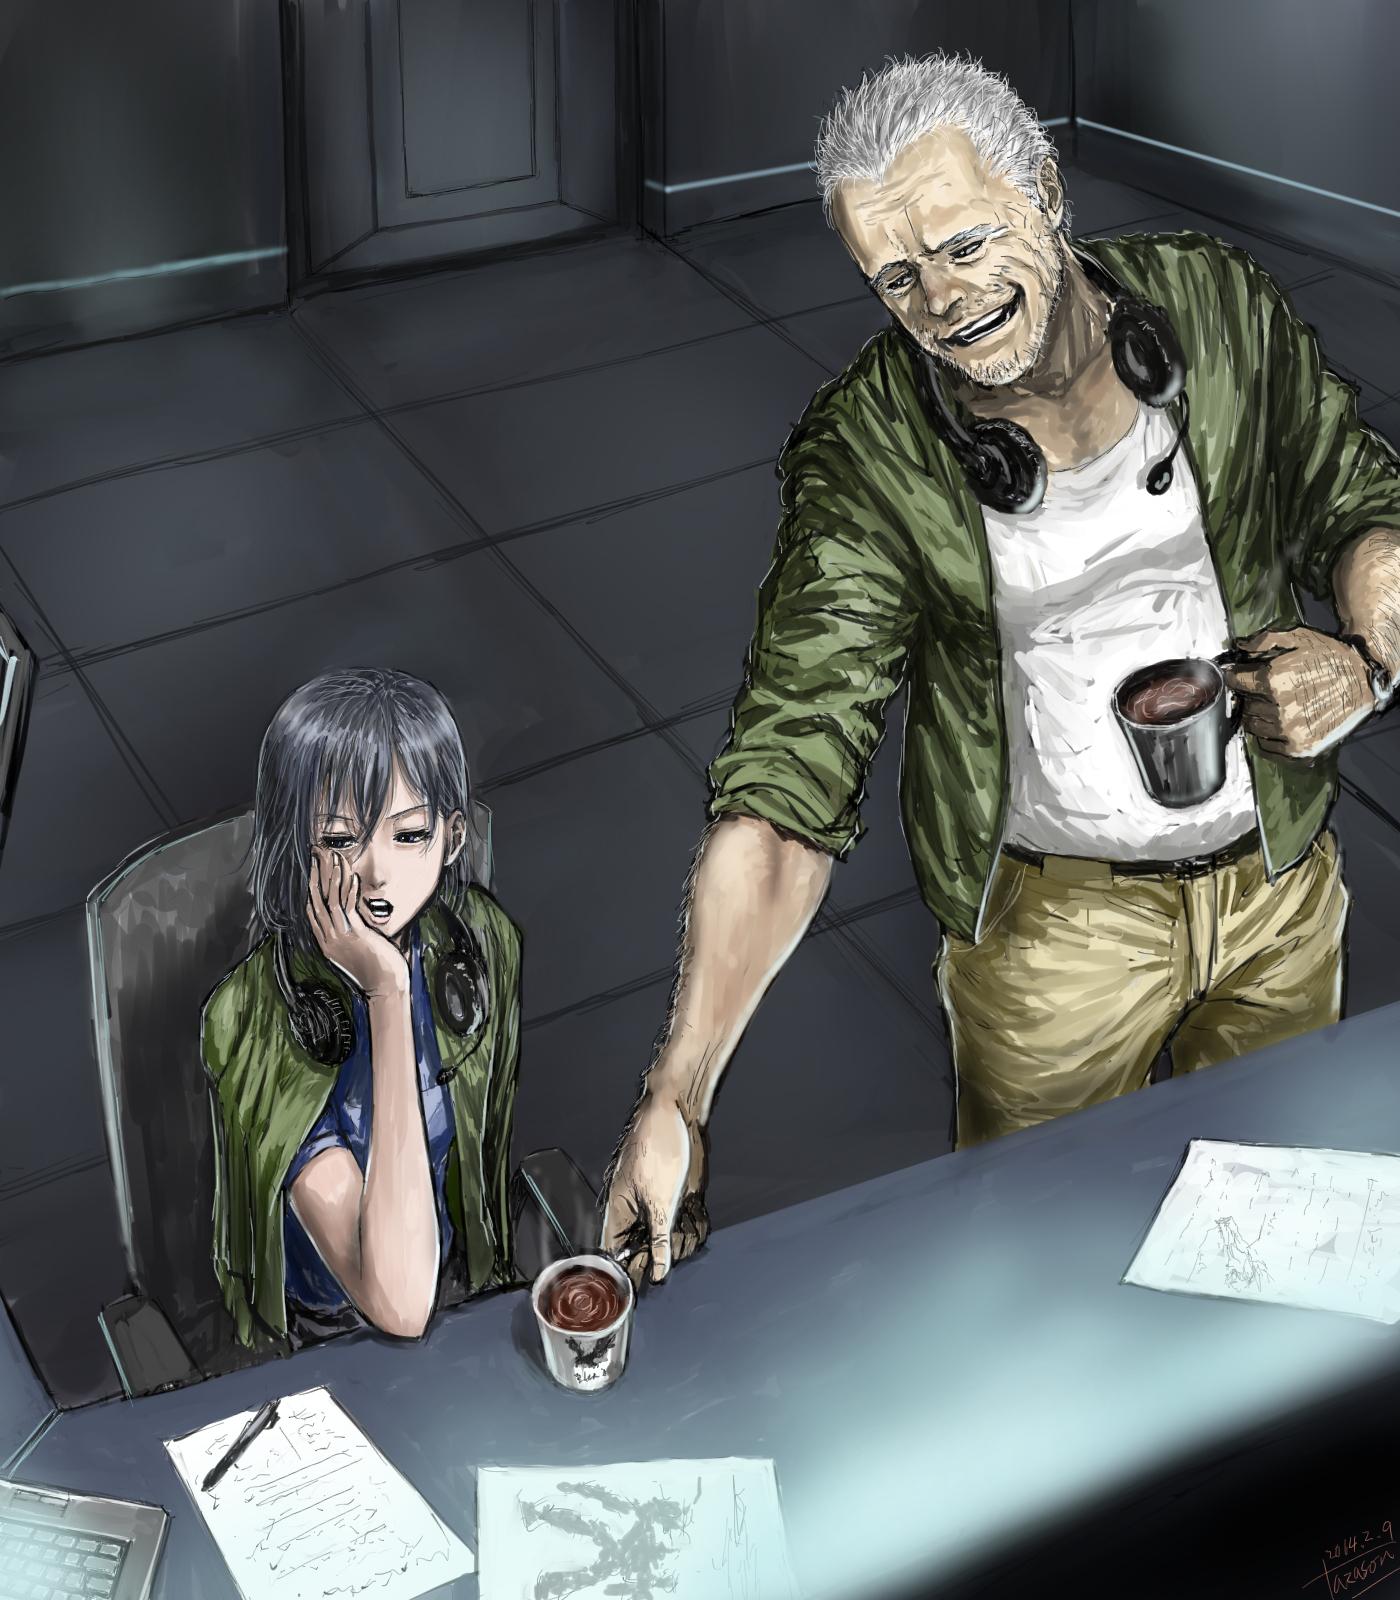 【ACVD】マギーとファットマン【イメージ】